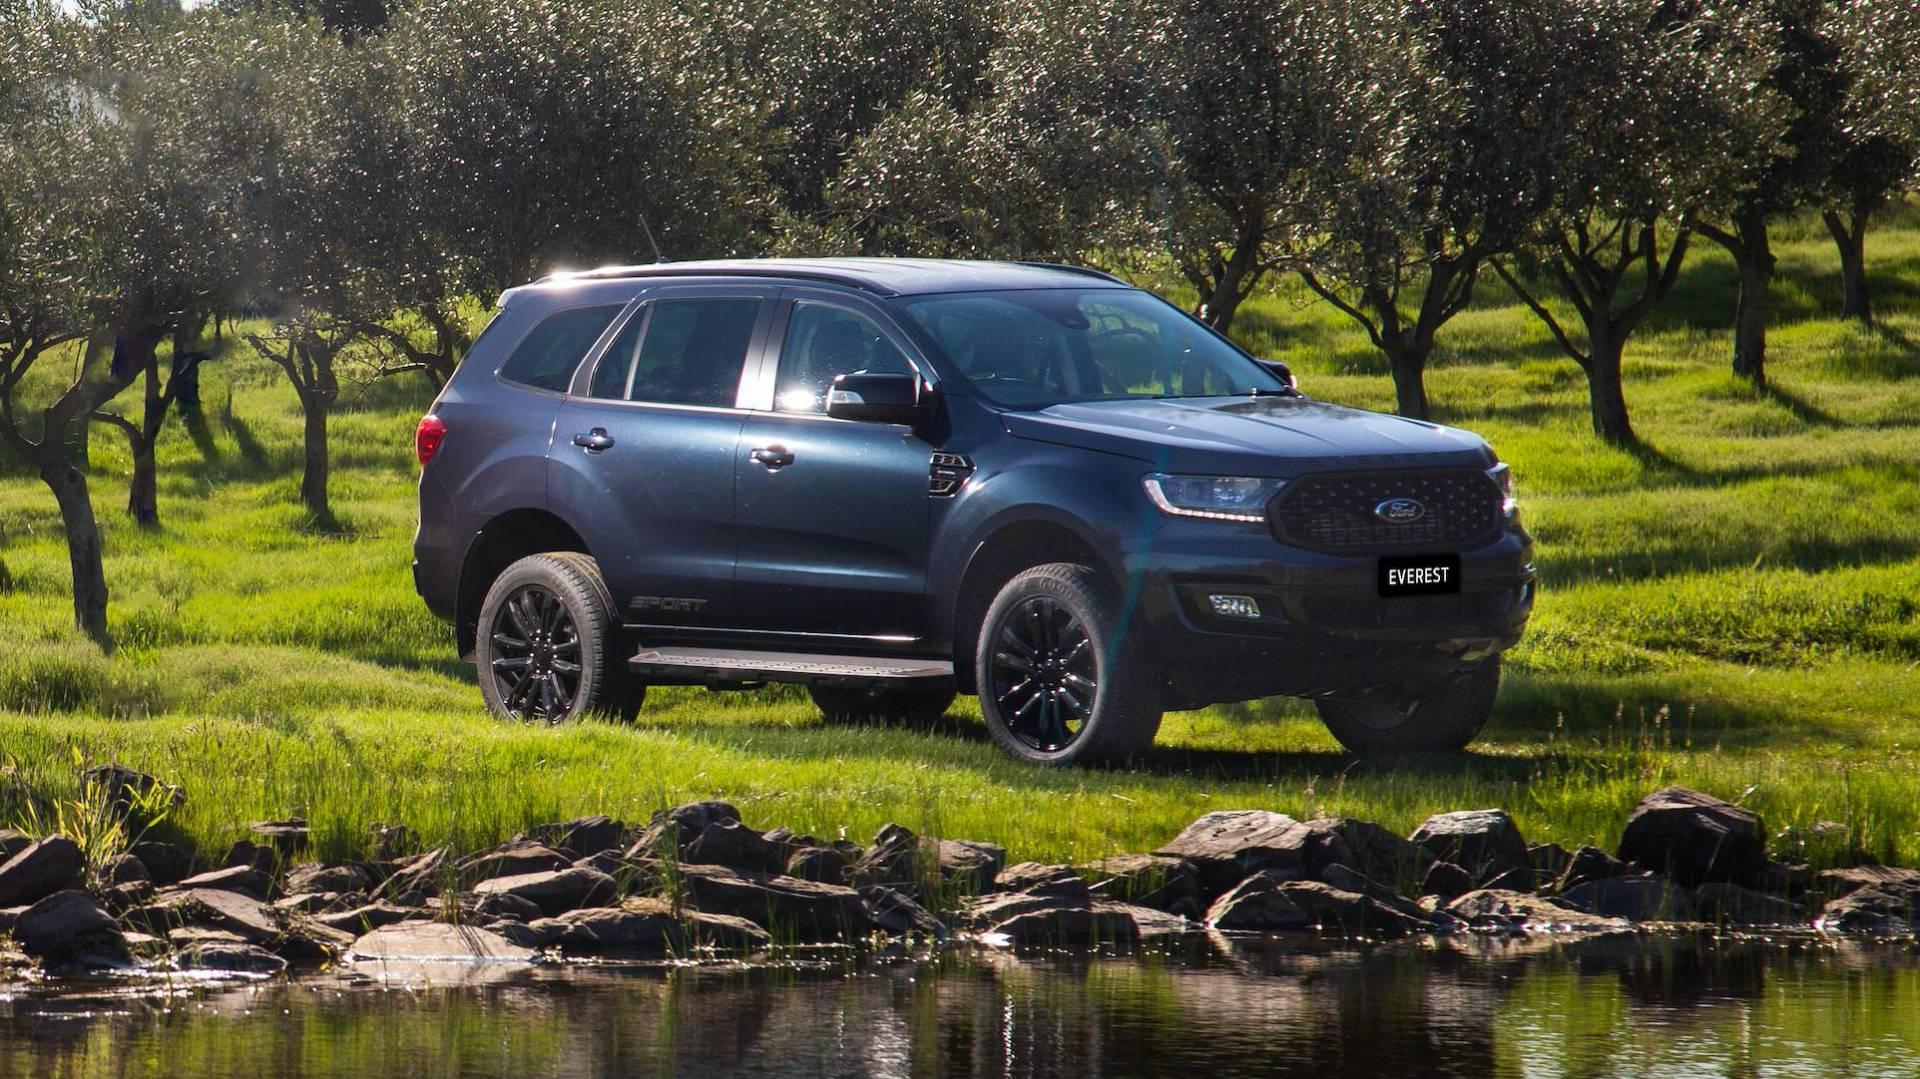 2021 ford everest sport australia spec 1 - Chi tiết Ford Everest Sport 2021 – Phiên bản thể thao cho phái mạnh